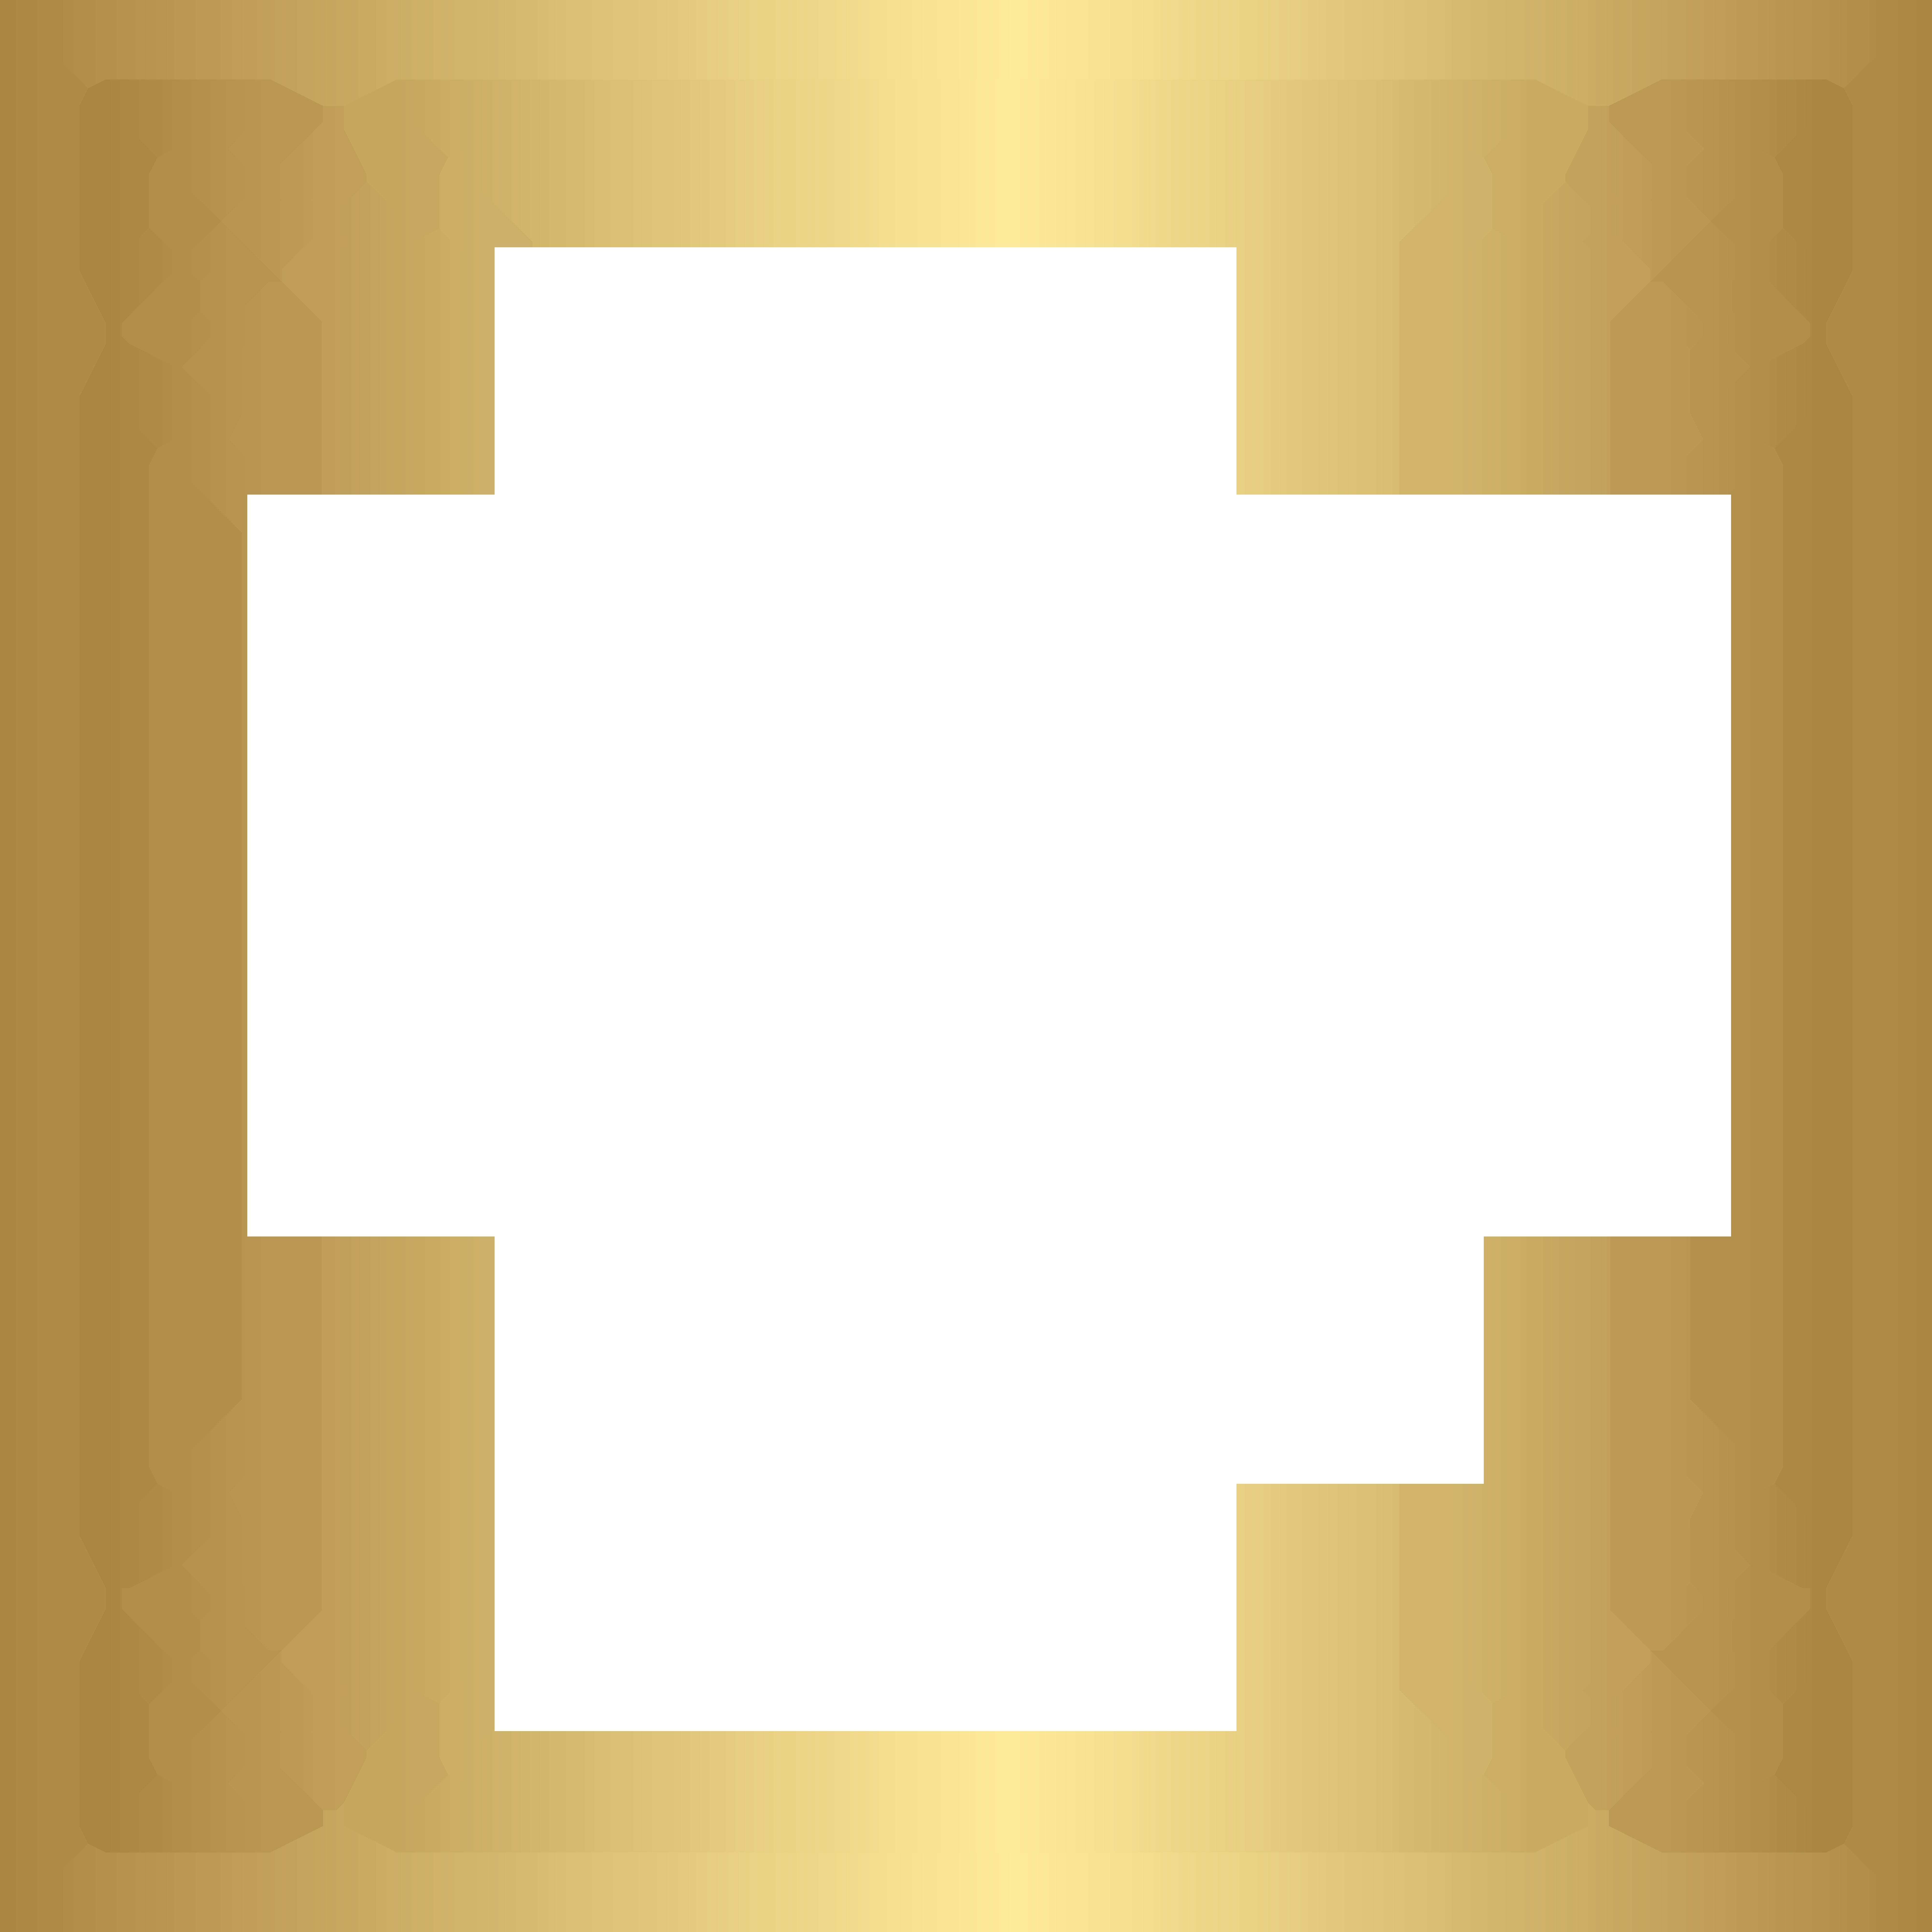 vector free download Art deco clipart. Clip border frame png